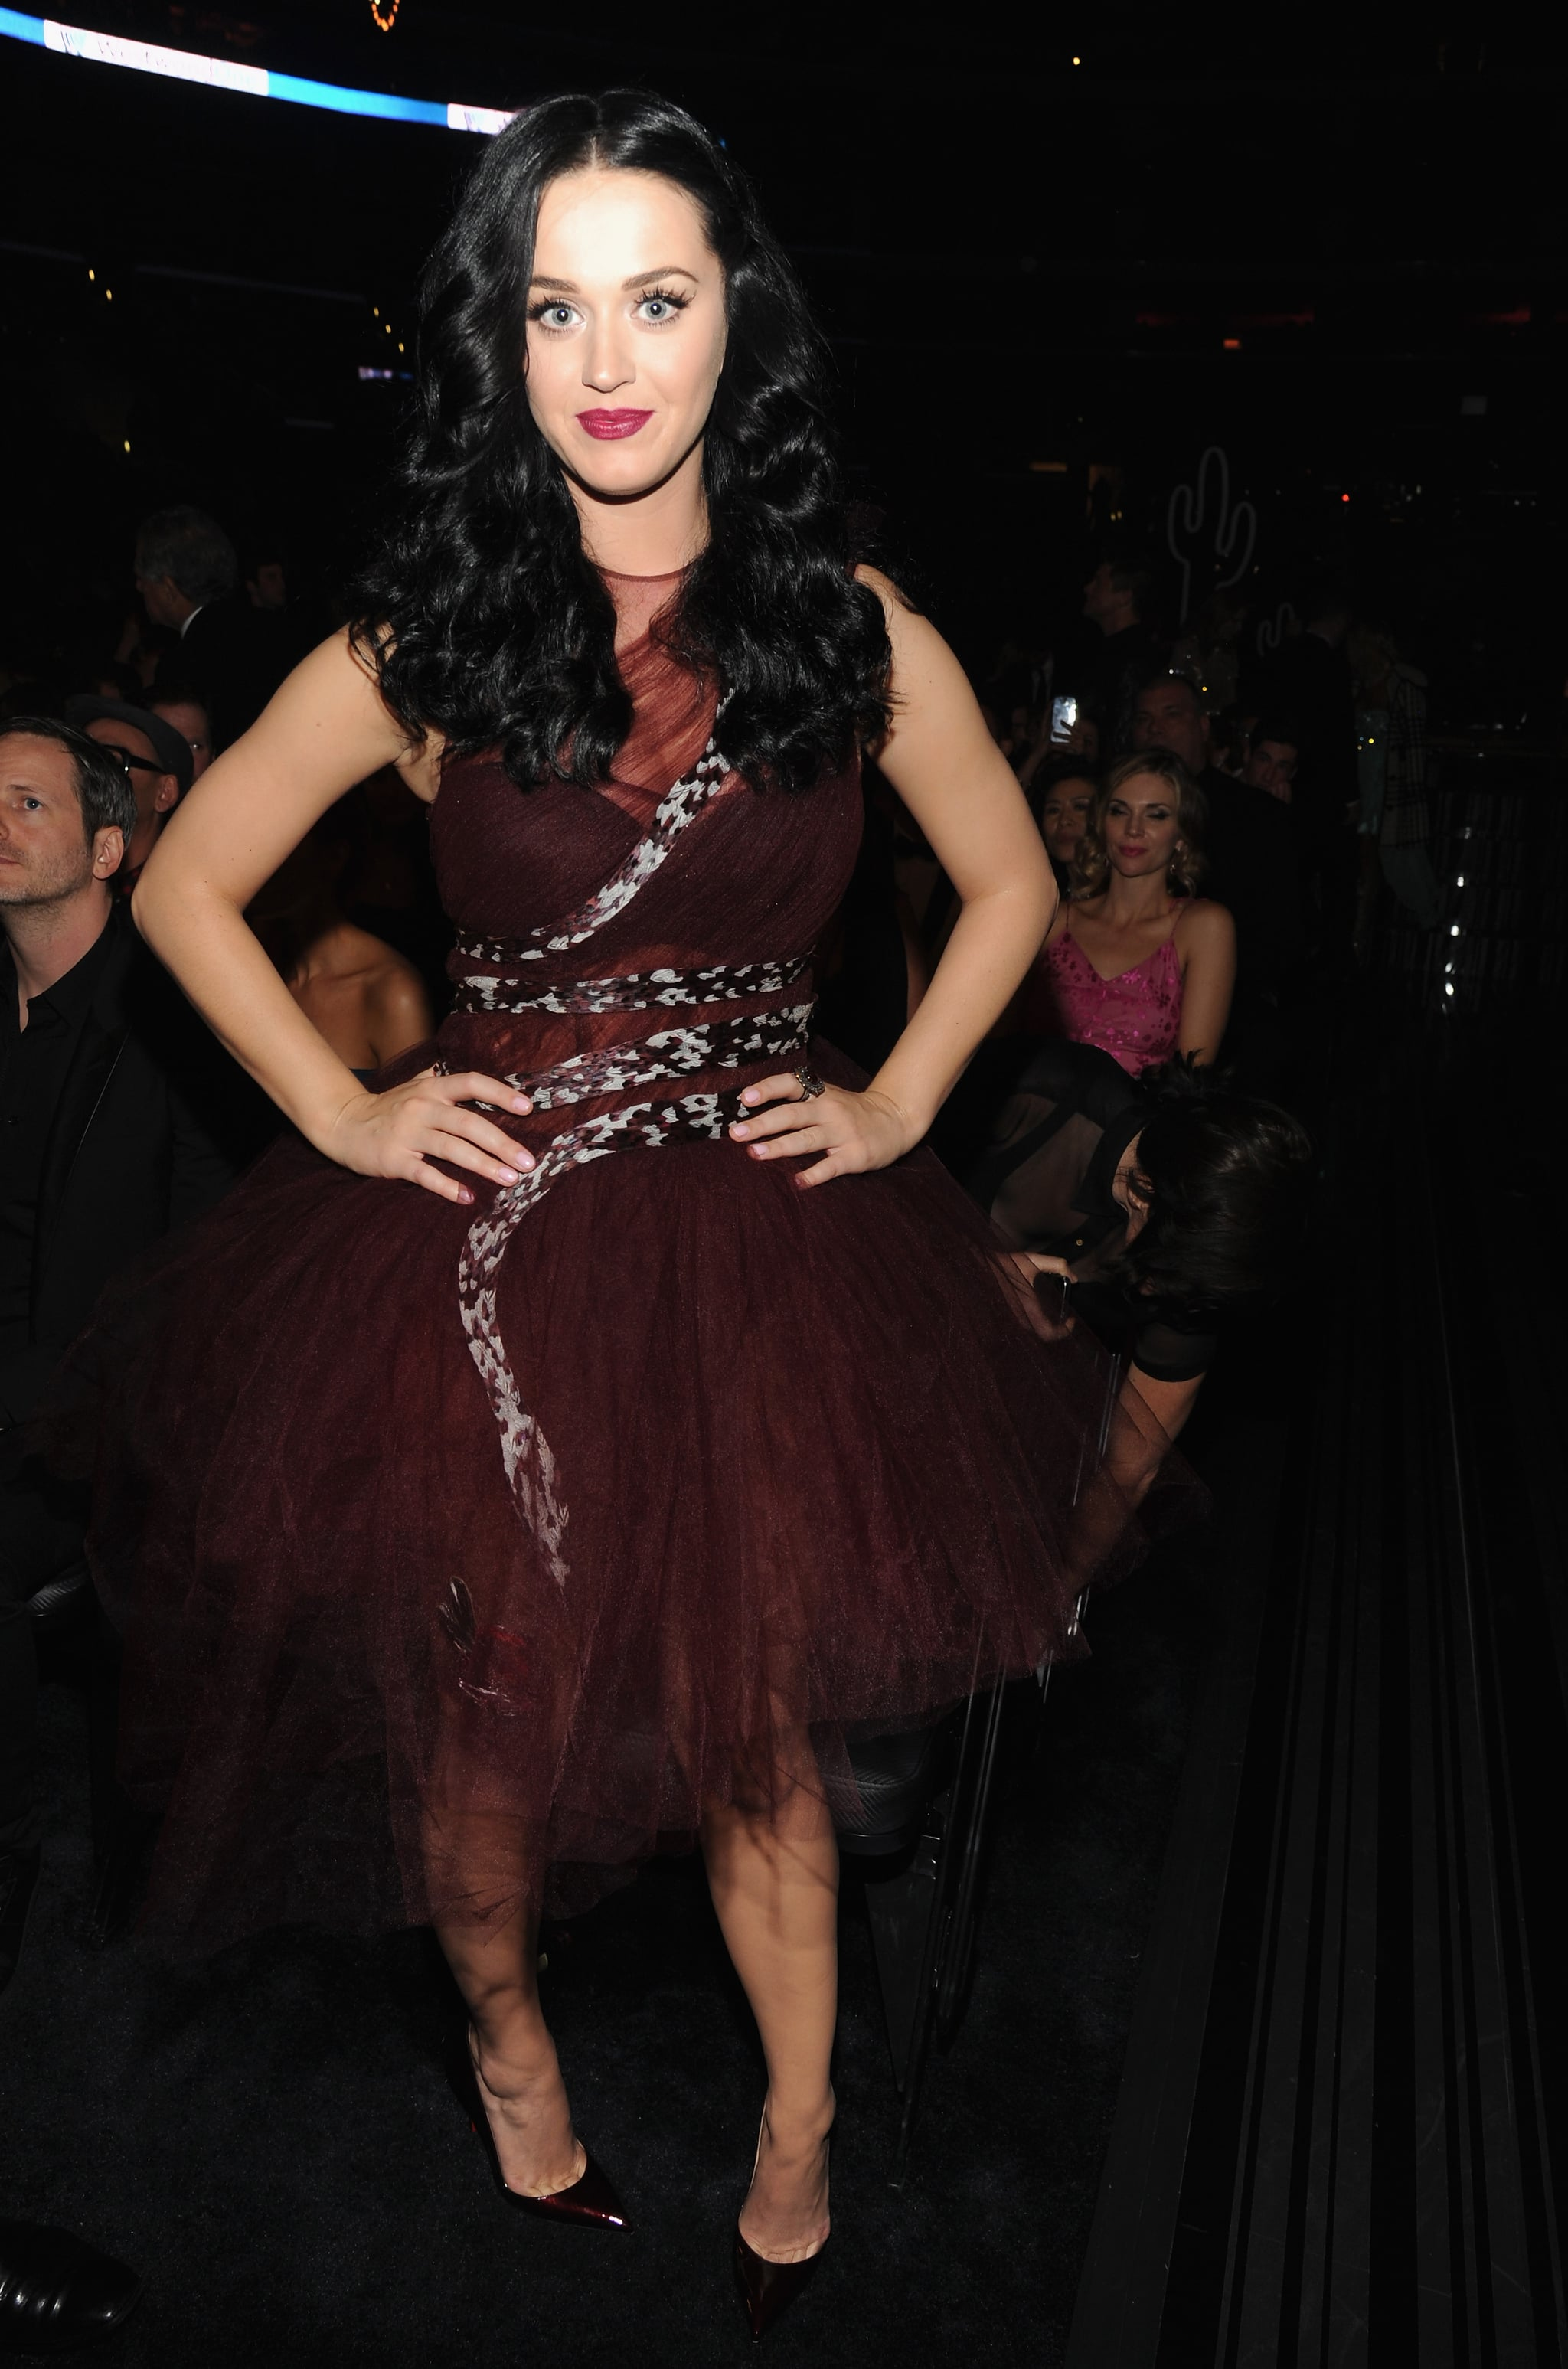 Katy Perry's Audience Look